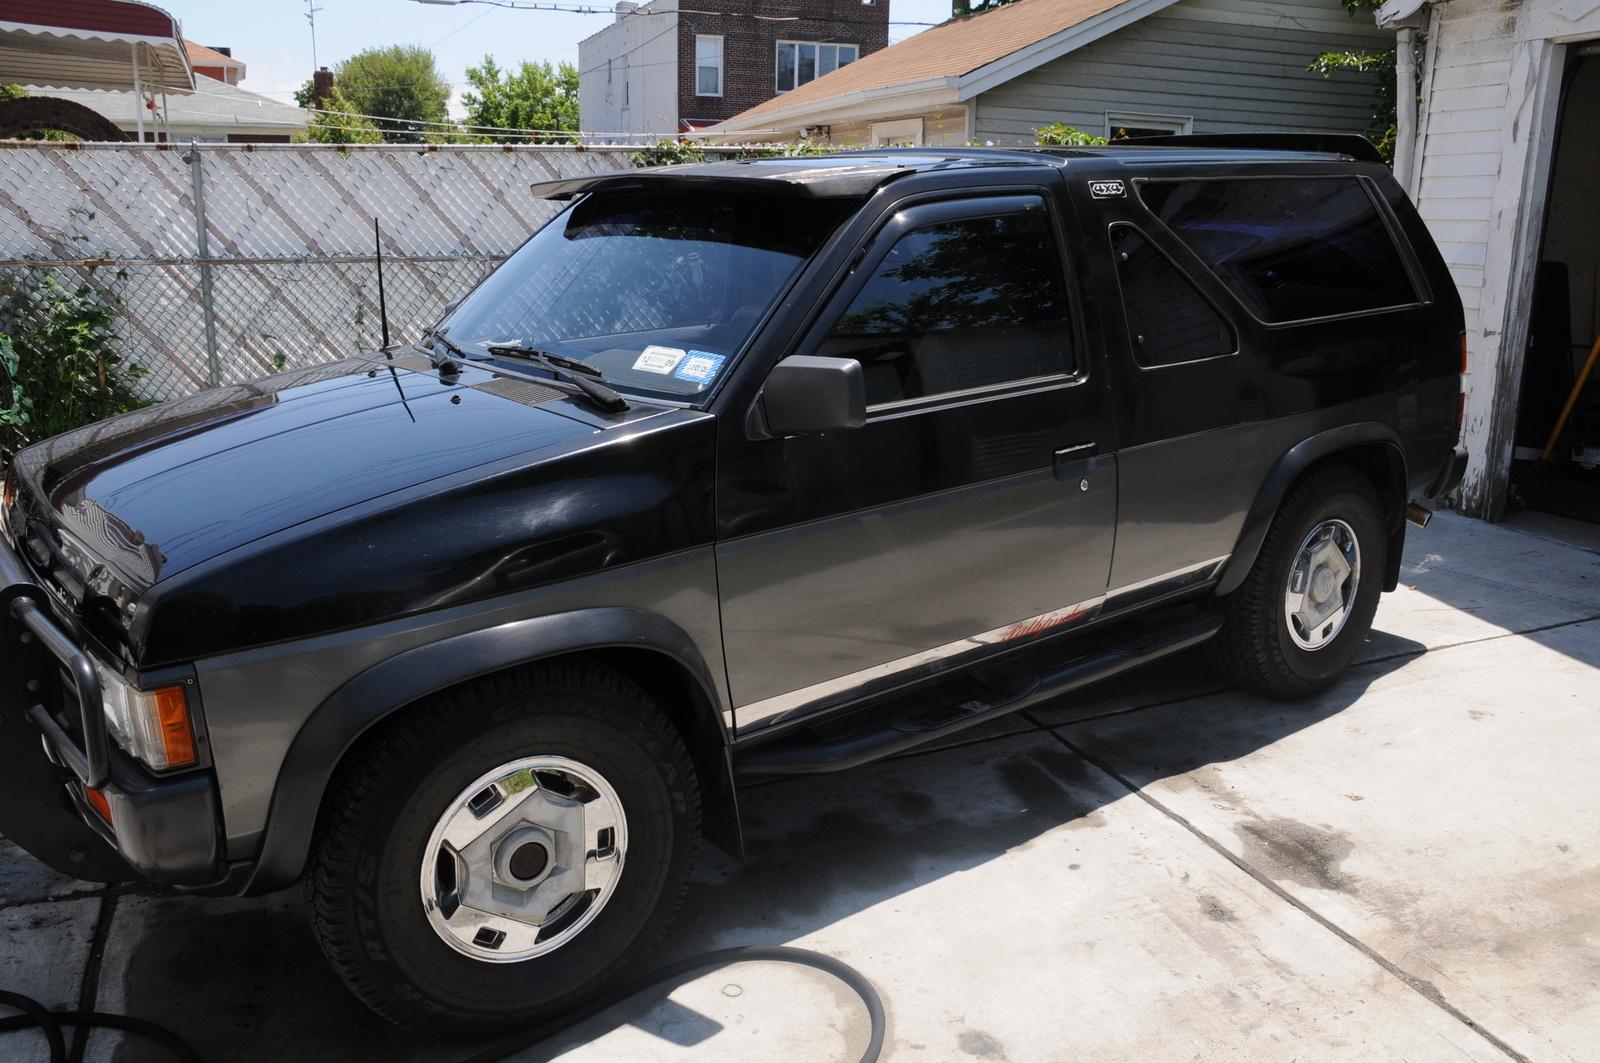 1989 Nissan Pathfinder Overview Cargurus